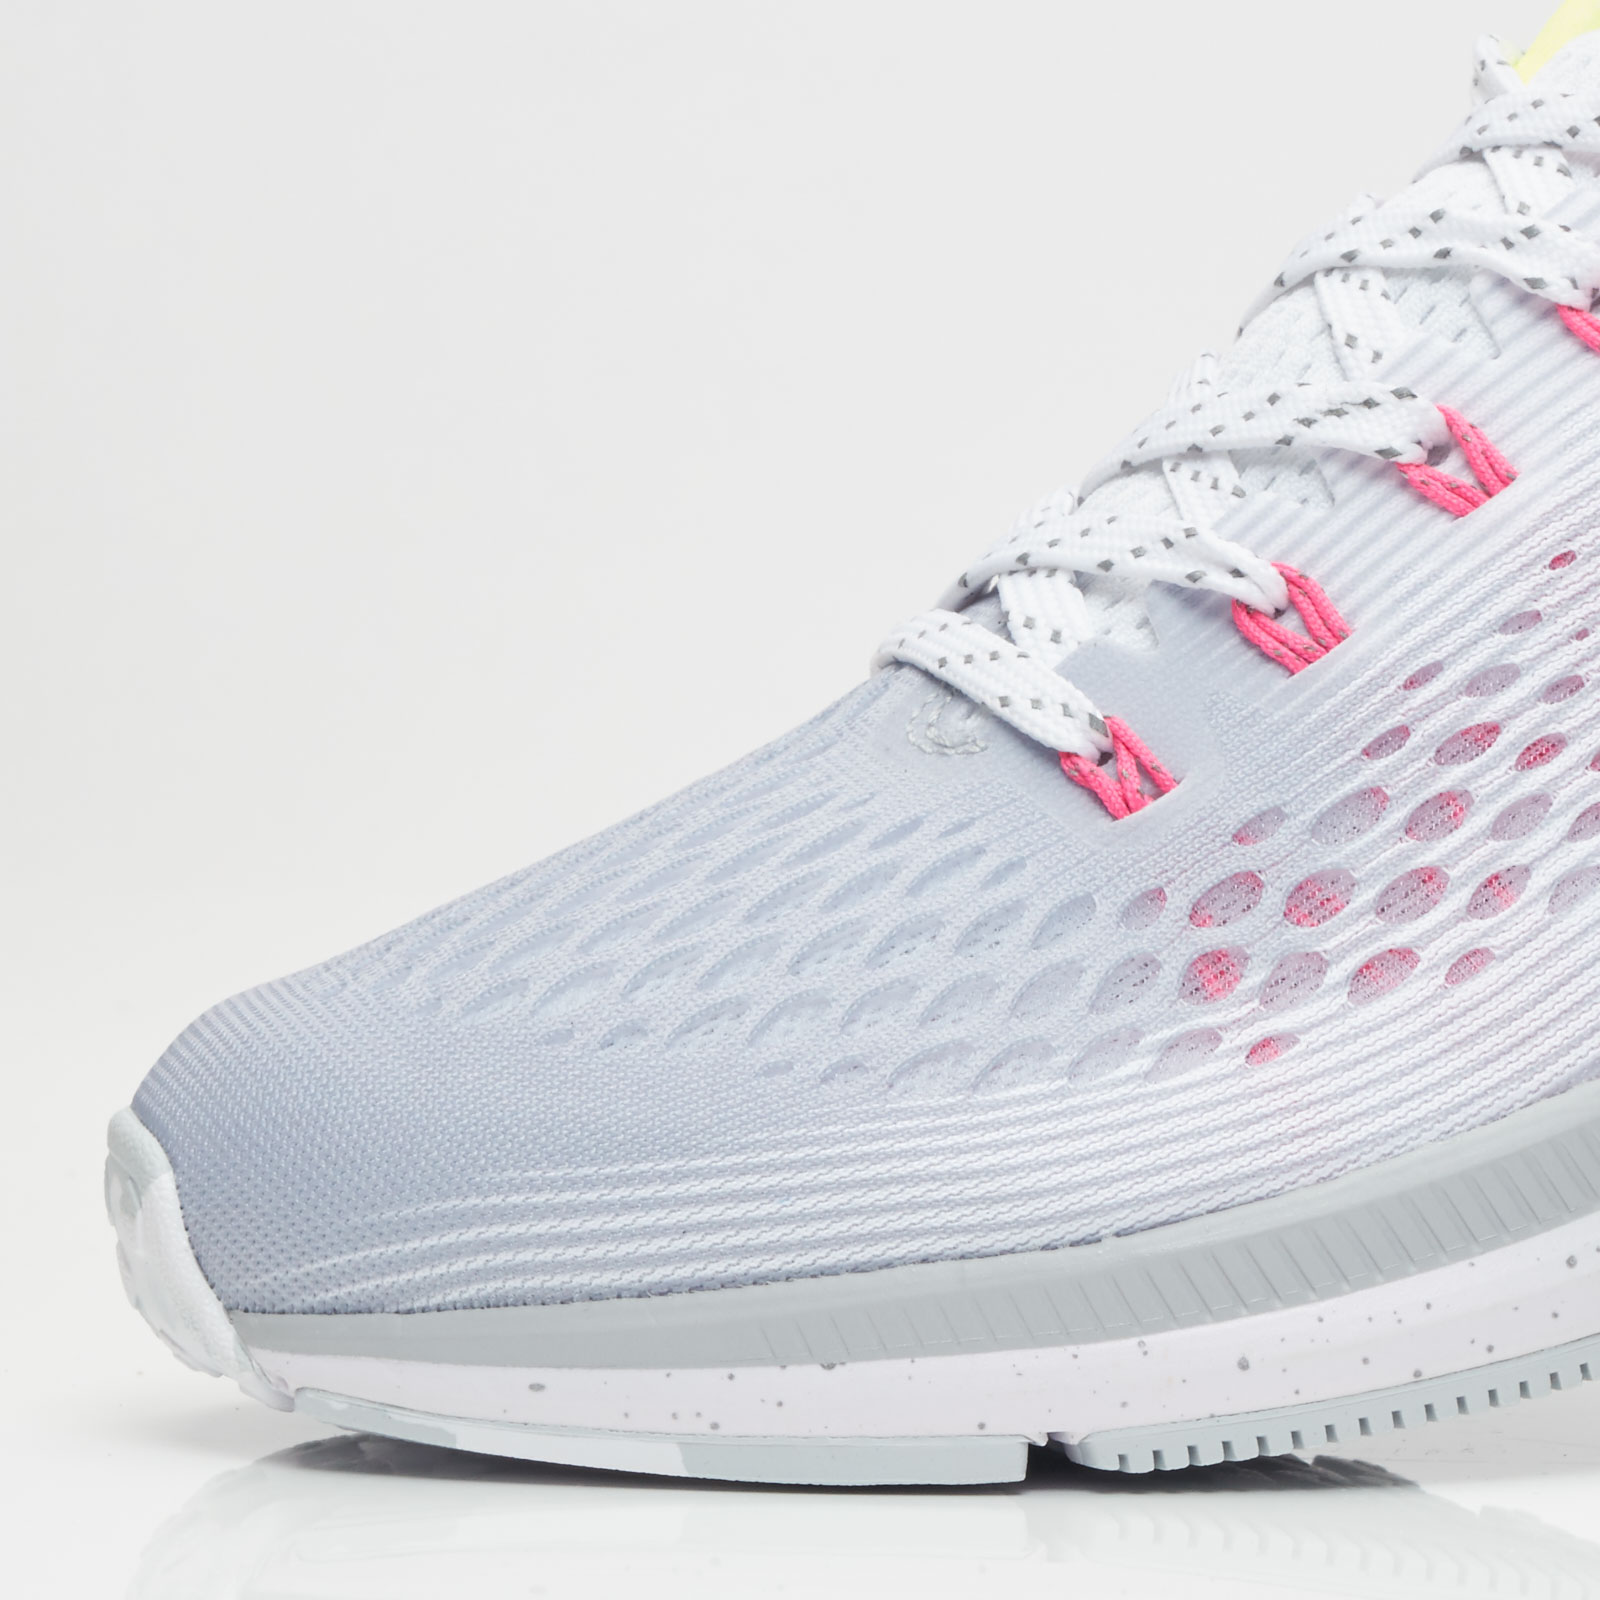 1cb5bcc638c4a2 Nike Air Zoom Pegasus 34 BETRUE - 899475-001 - Sneakersnstuff ...